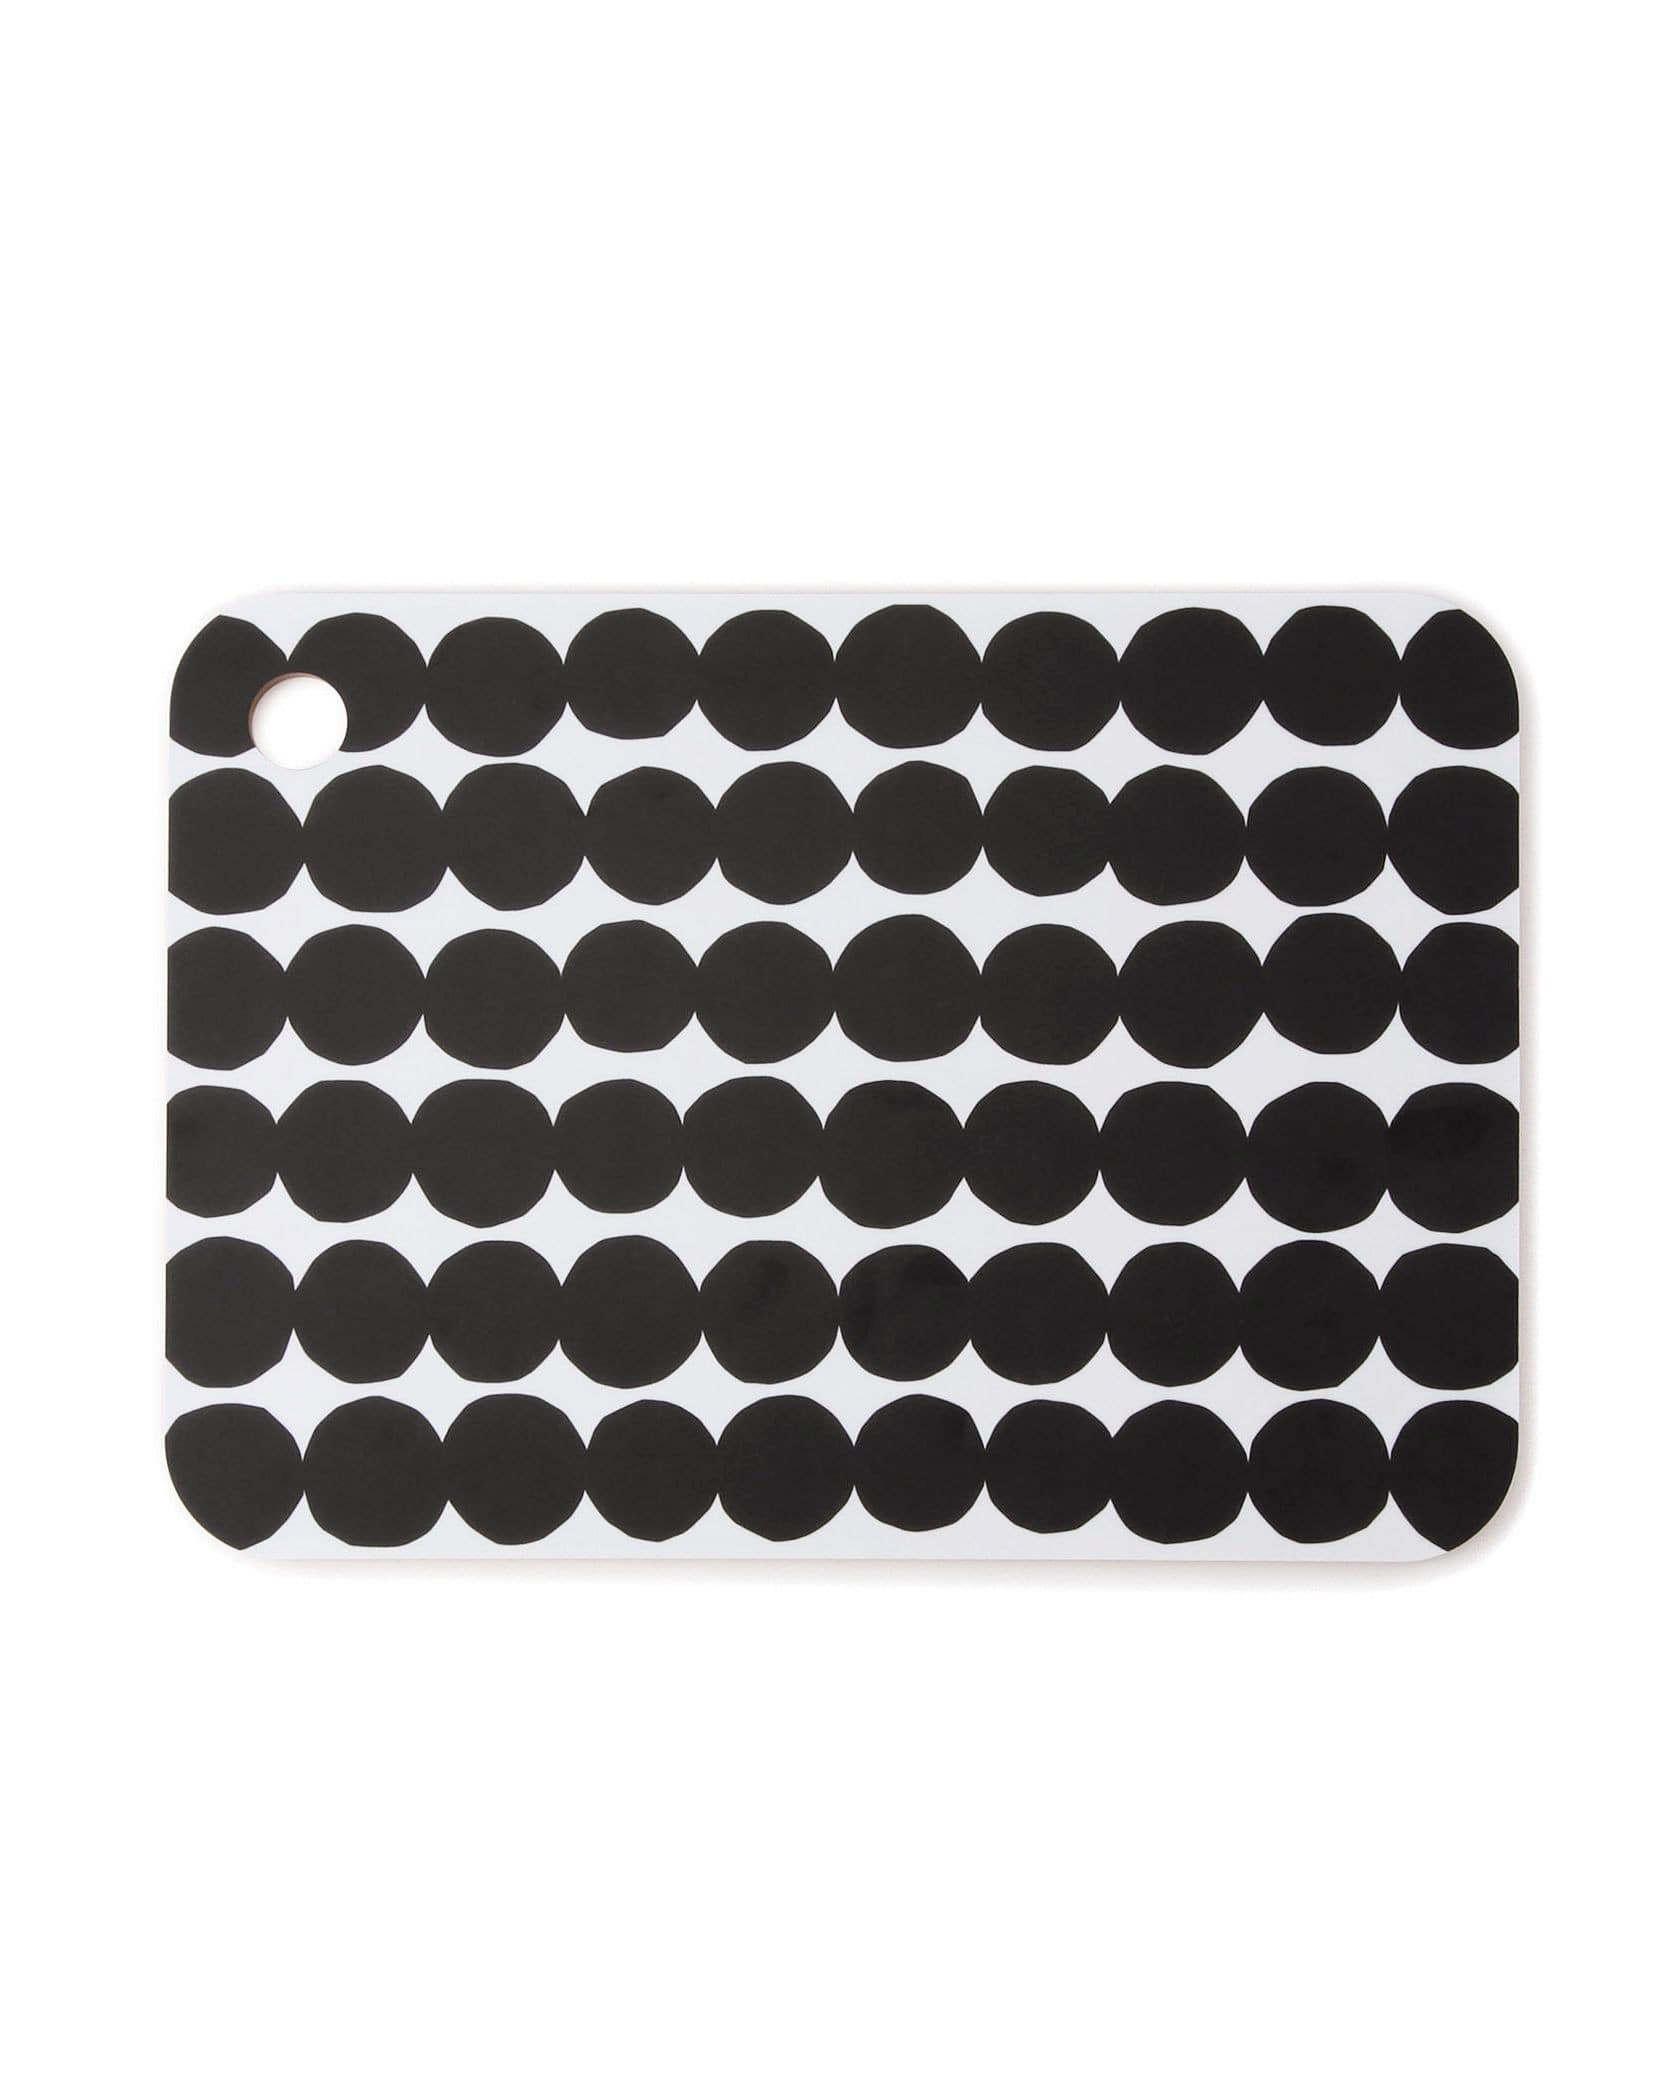 Rasymatto チョッピングボード